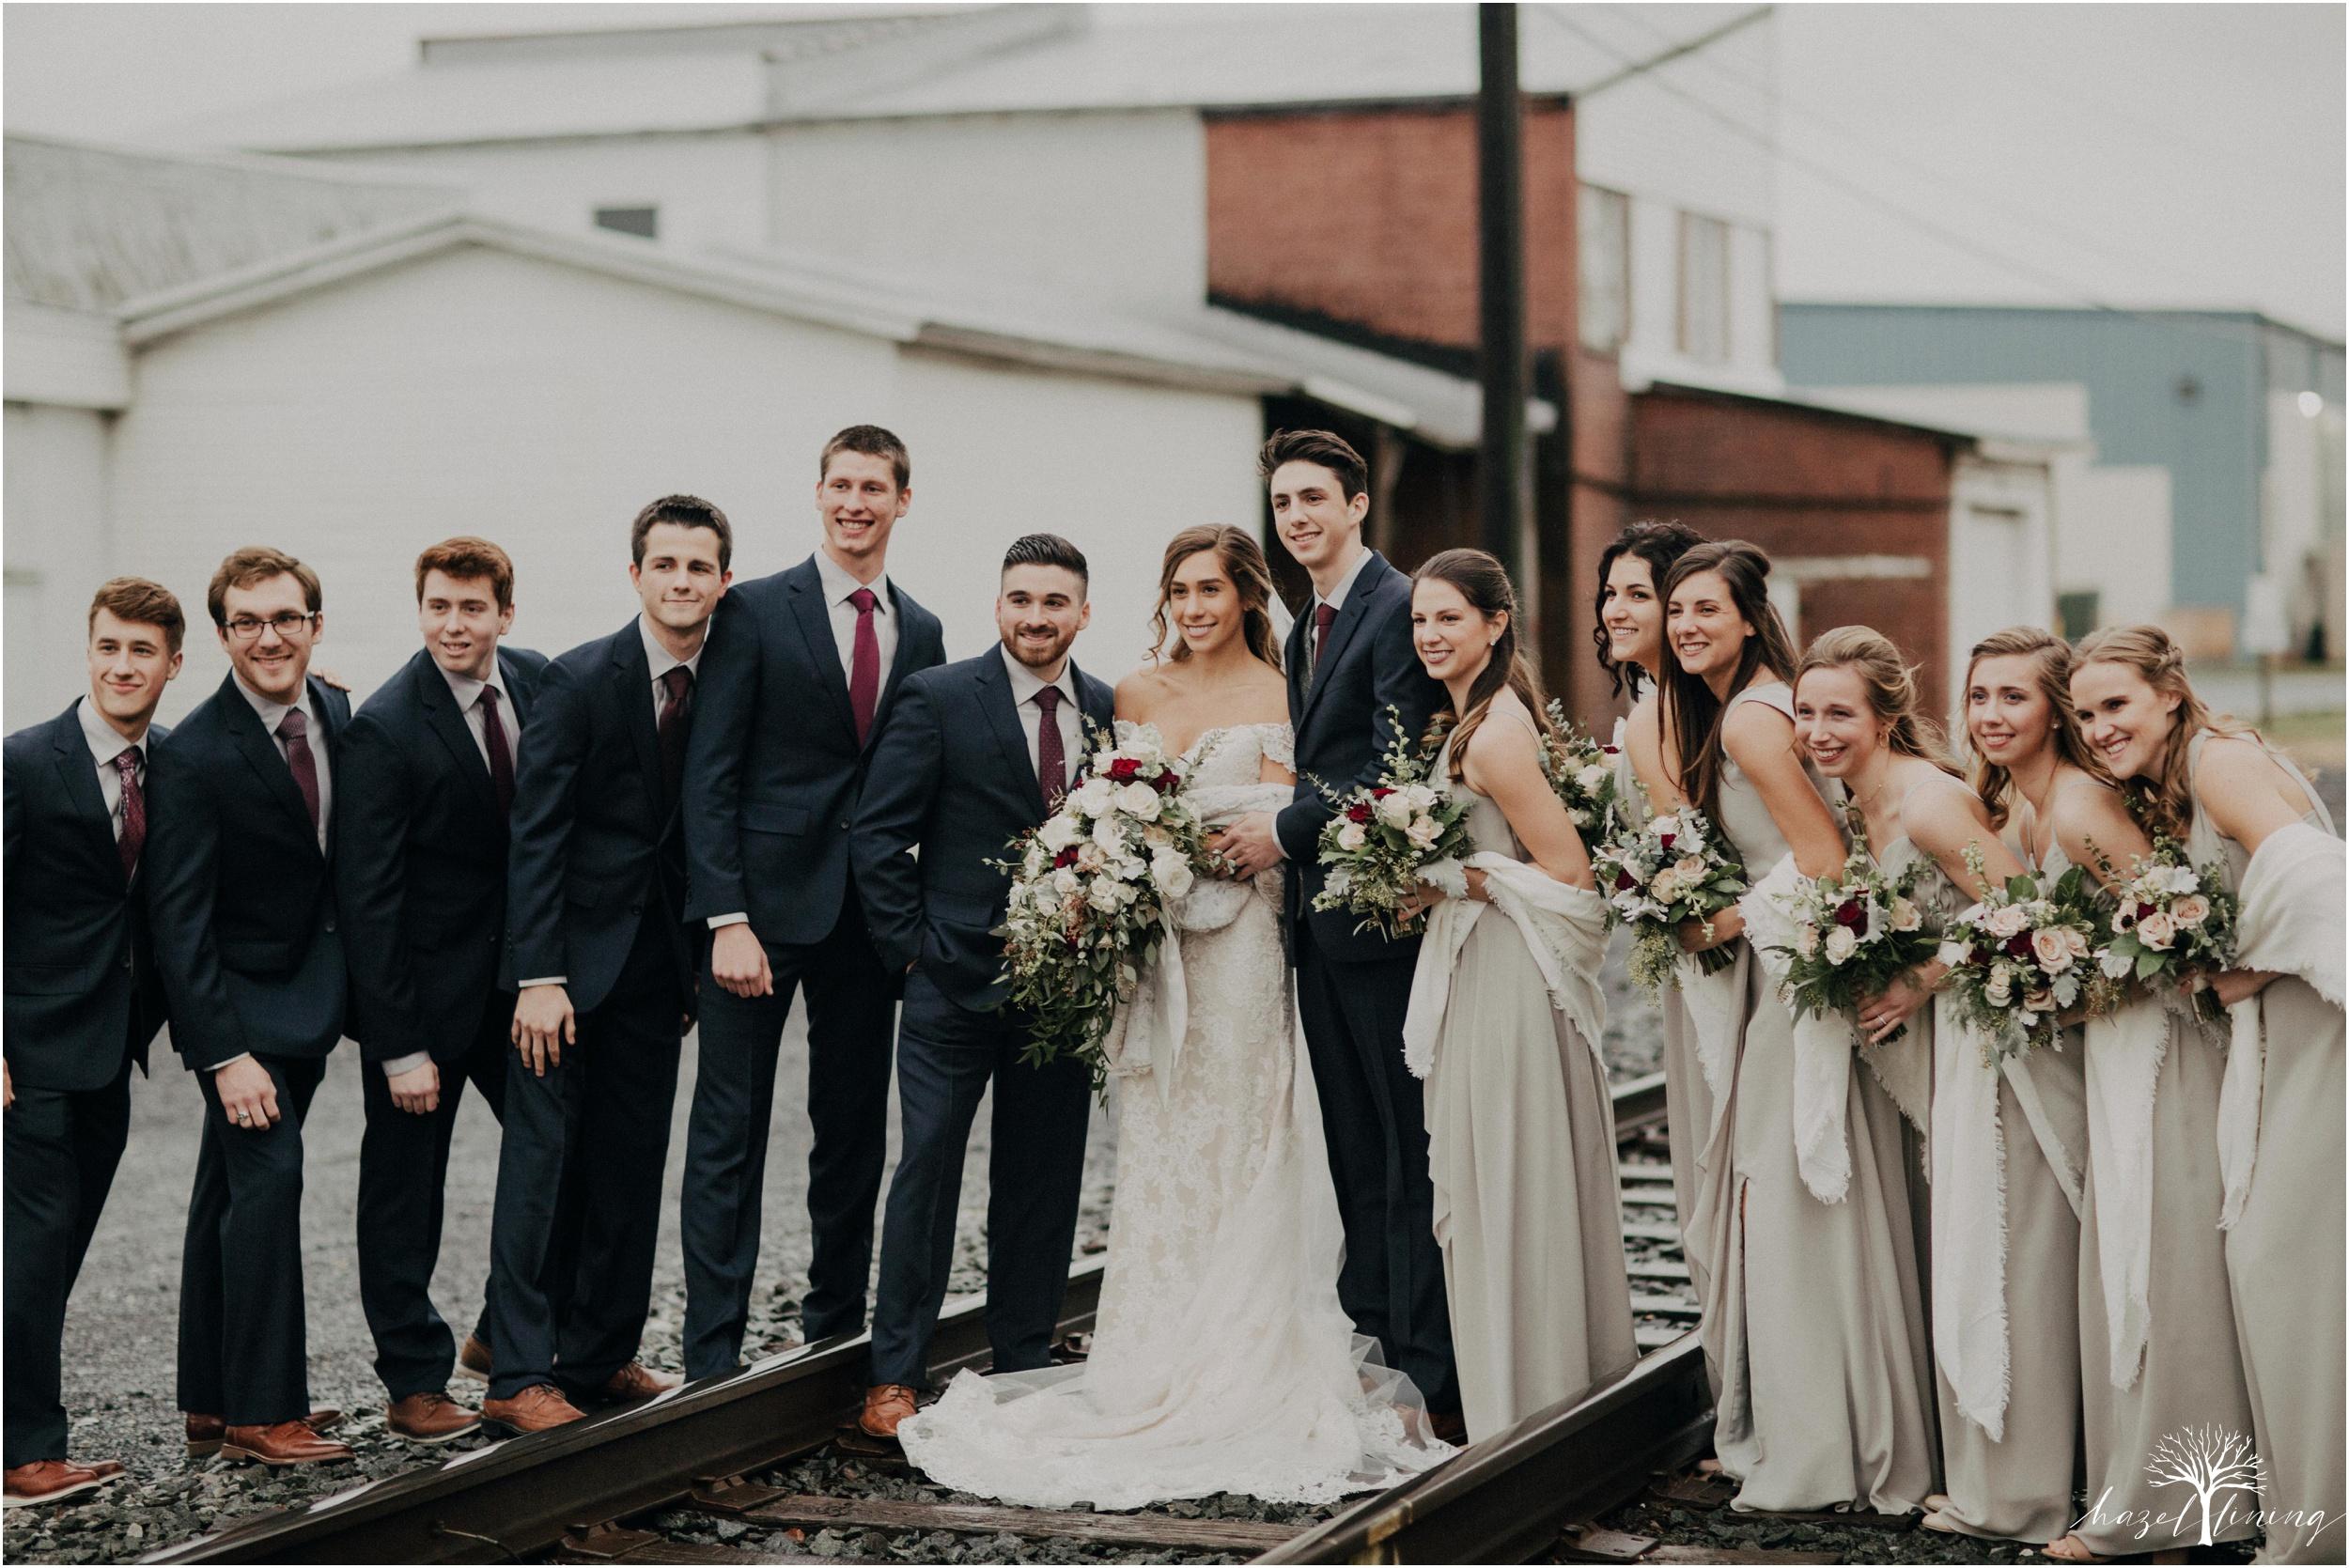 emma-matt-gehringer-the-booking-house-lancaster-manhiem-pennsylvania-winter-wedding_0069.jpg